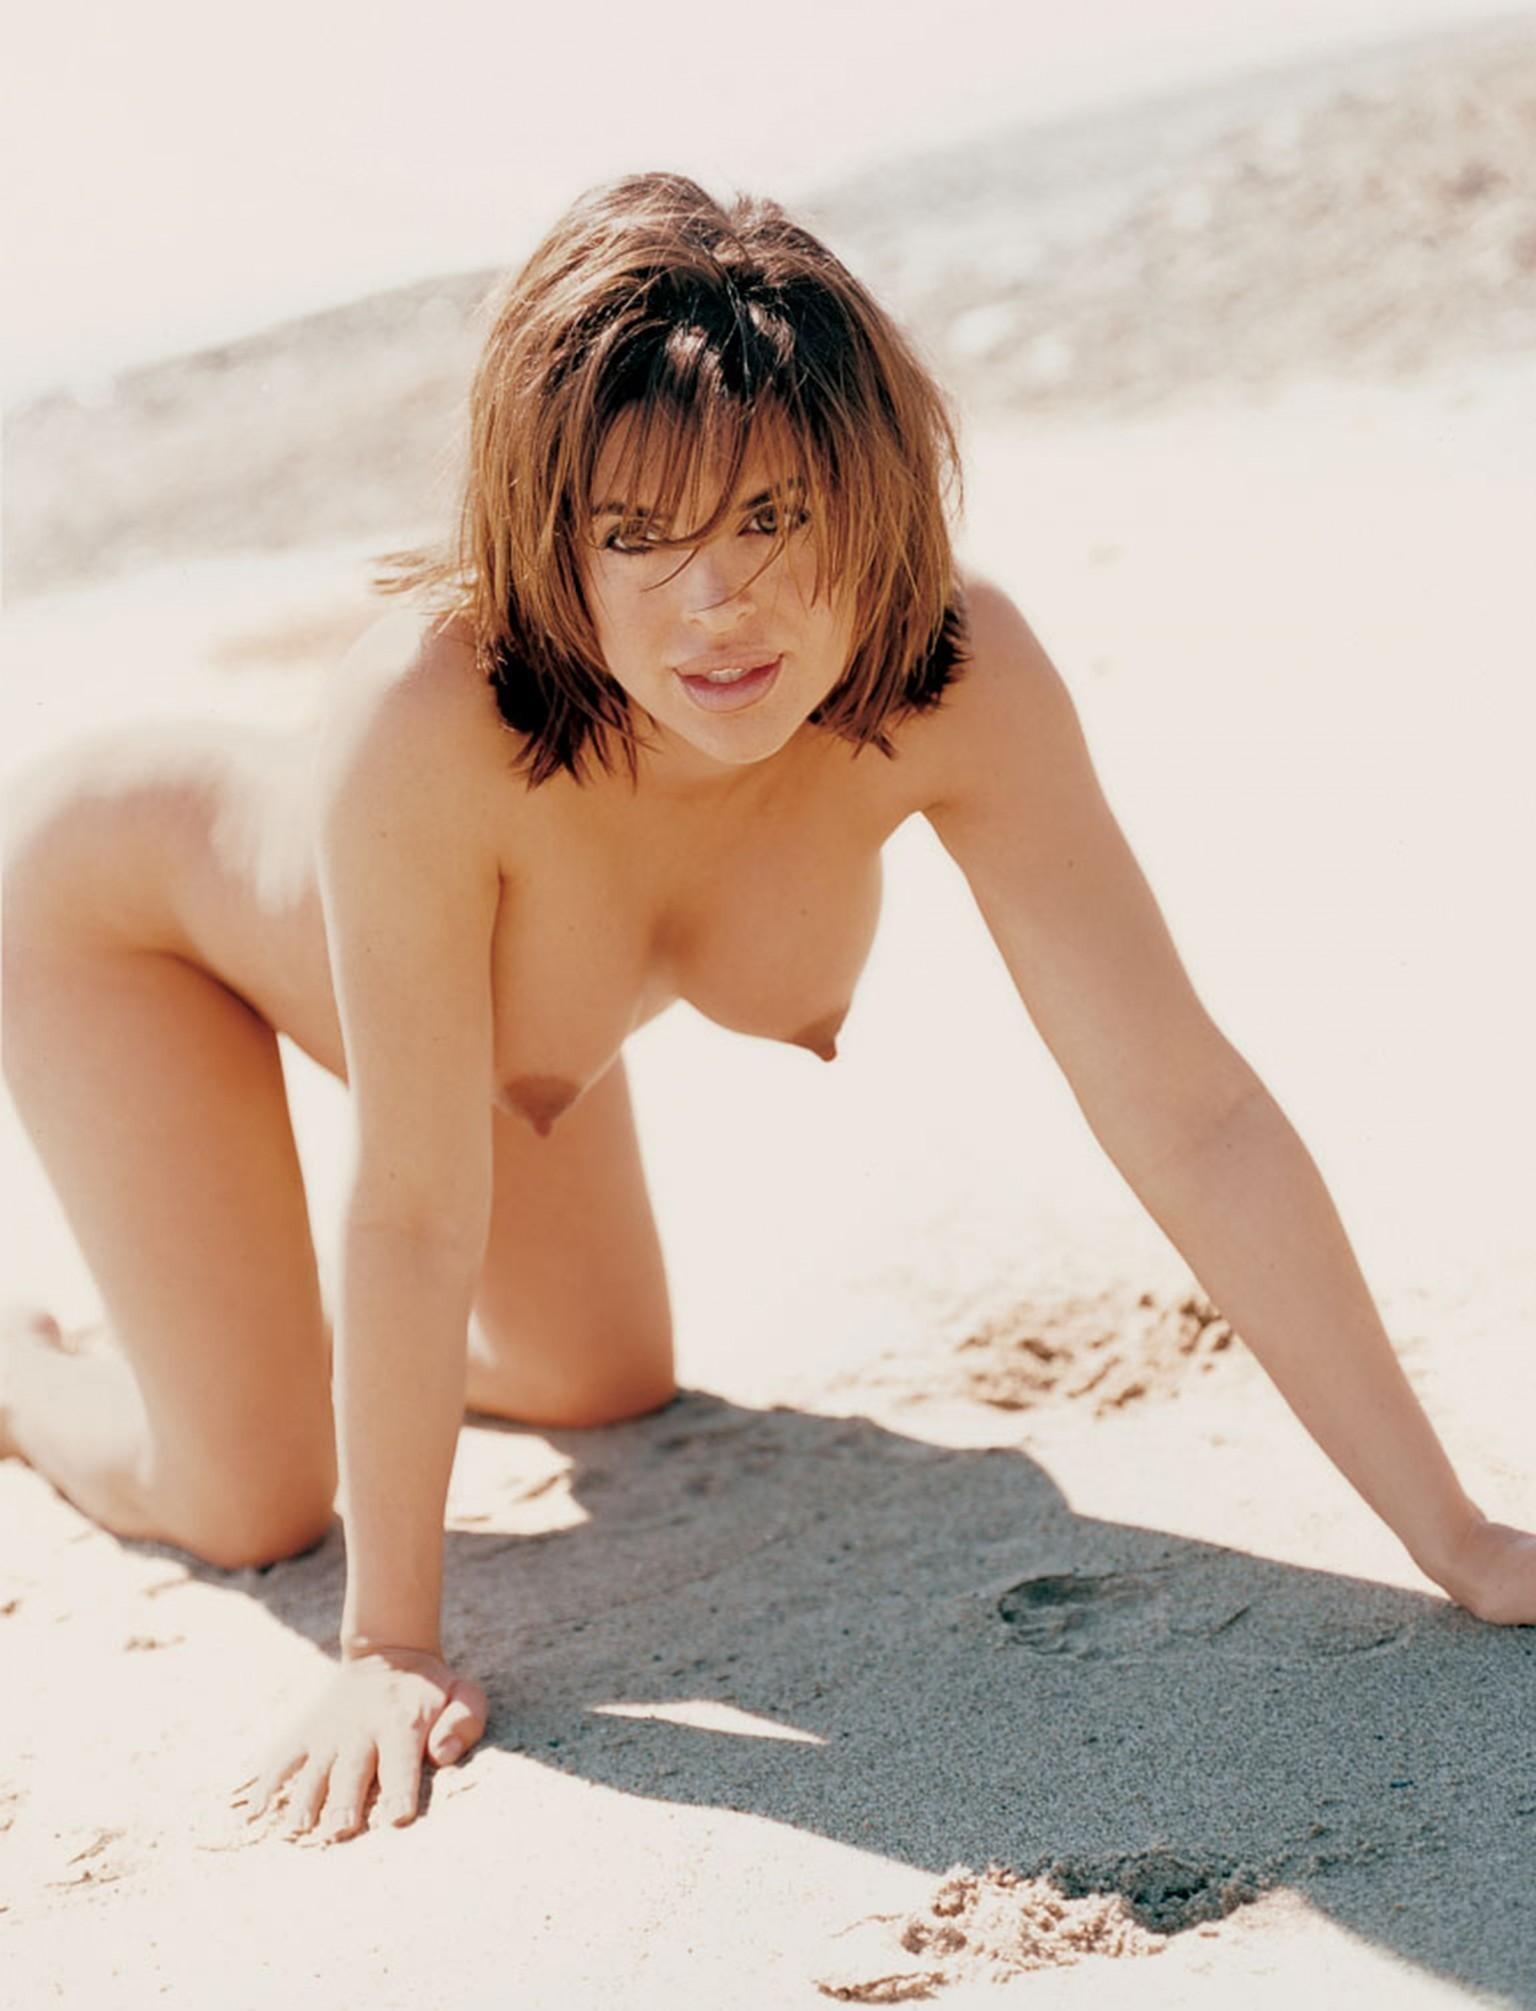 Lisa rinna sexy pic